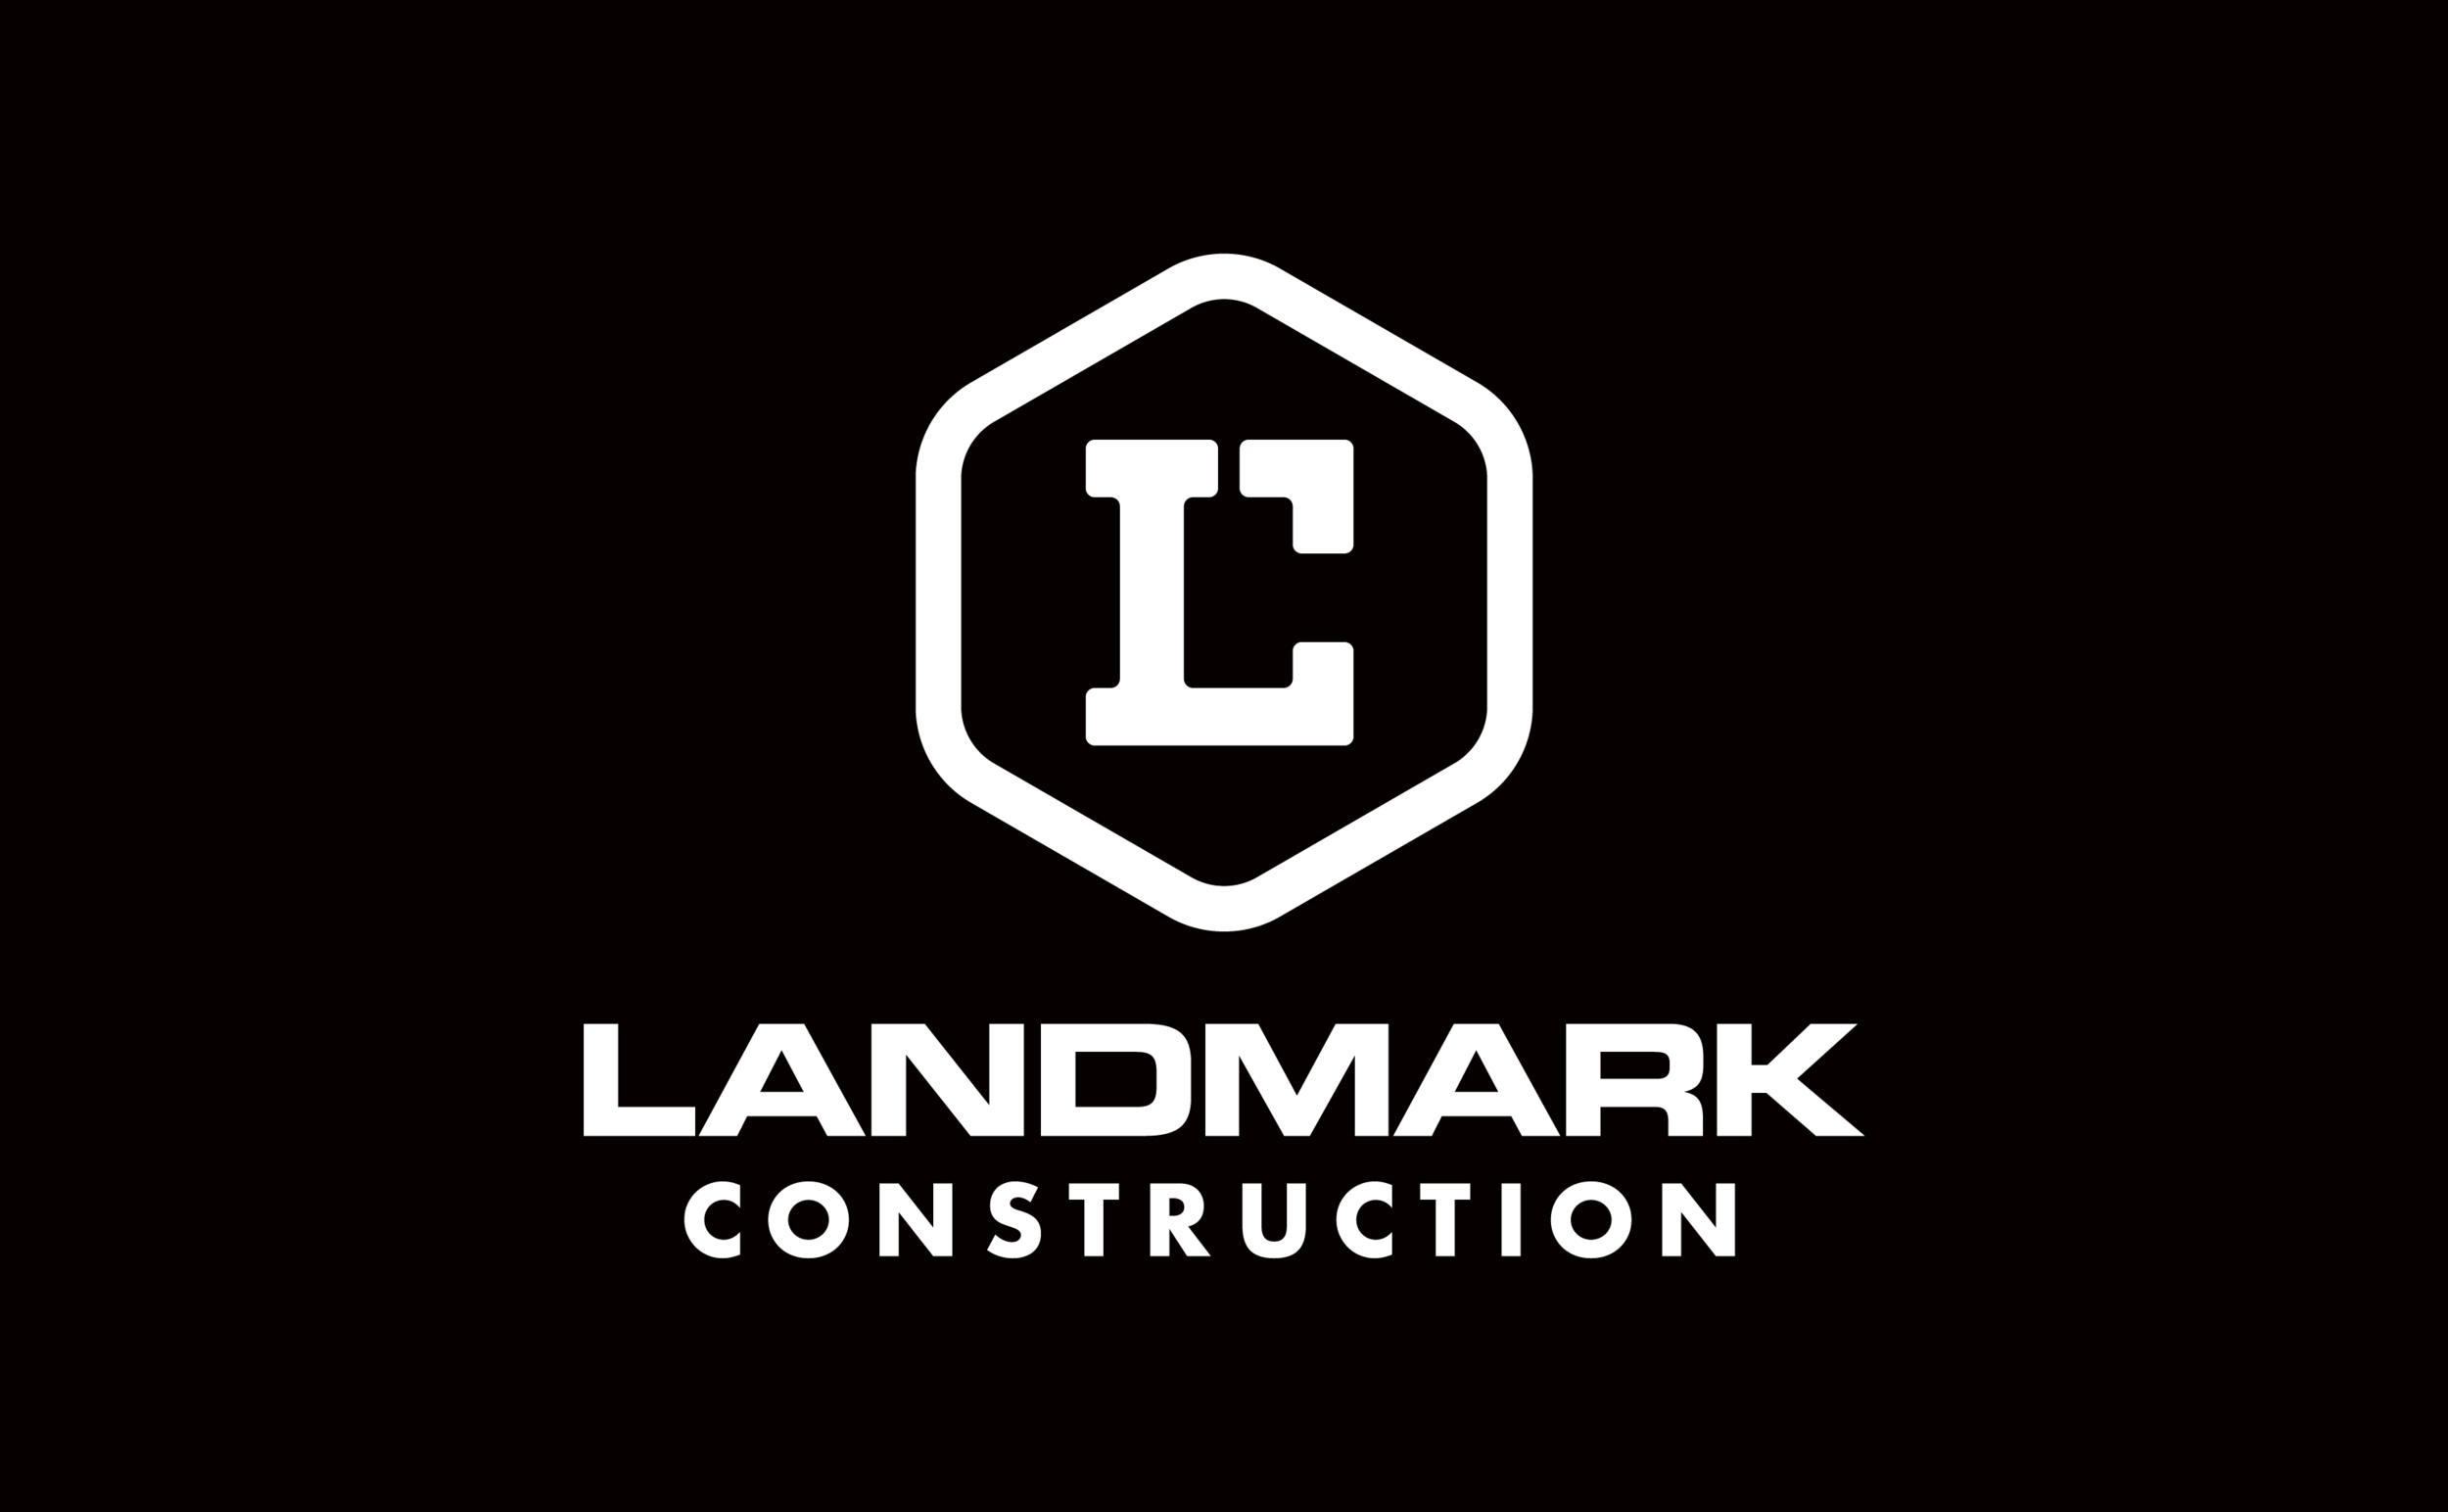 landmark_007.png